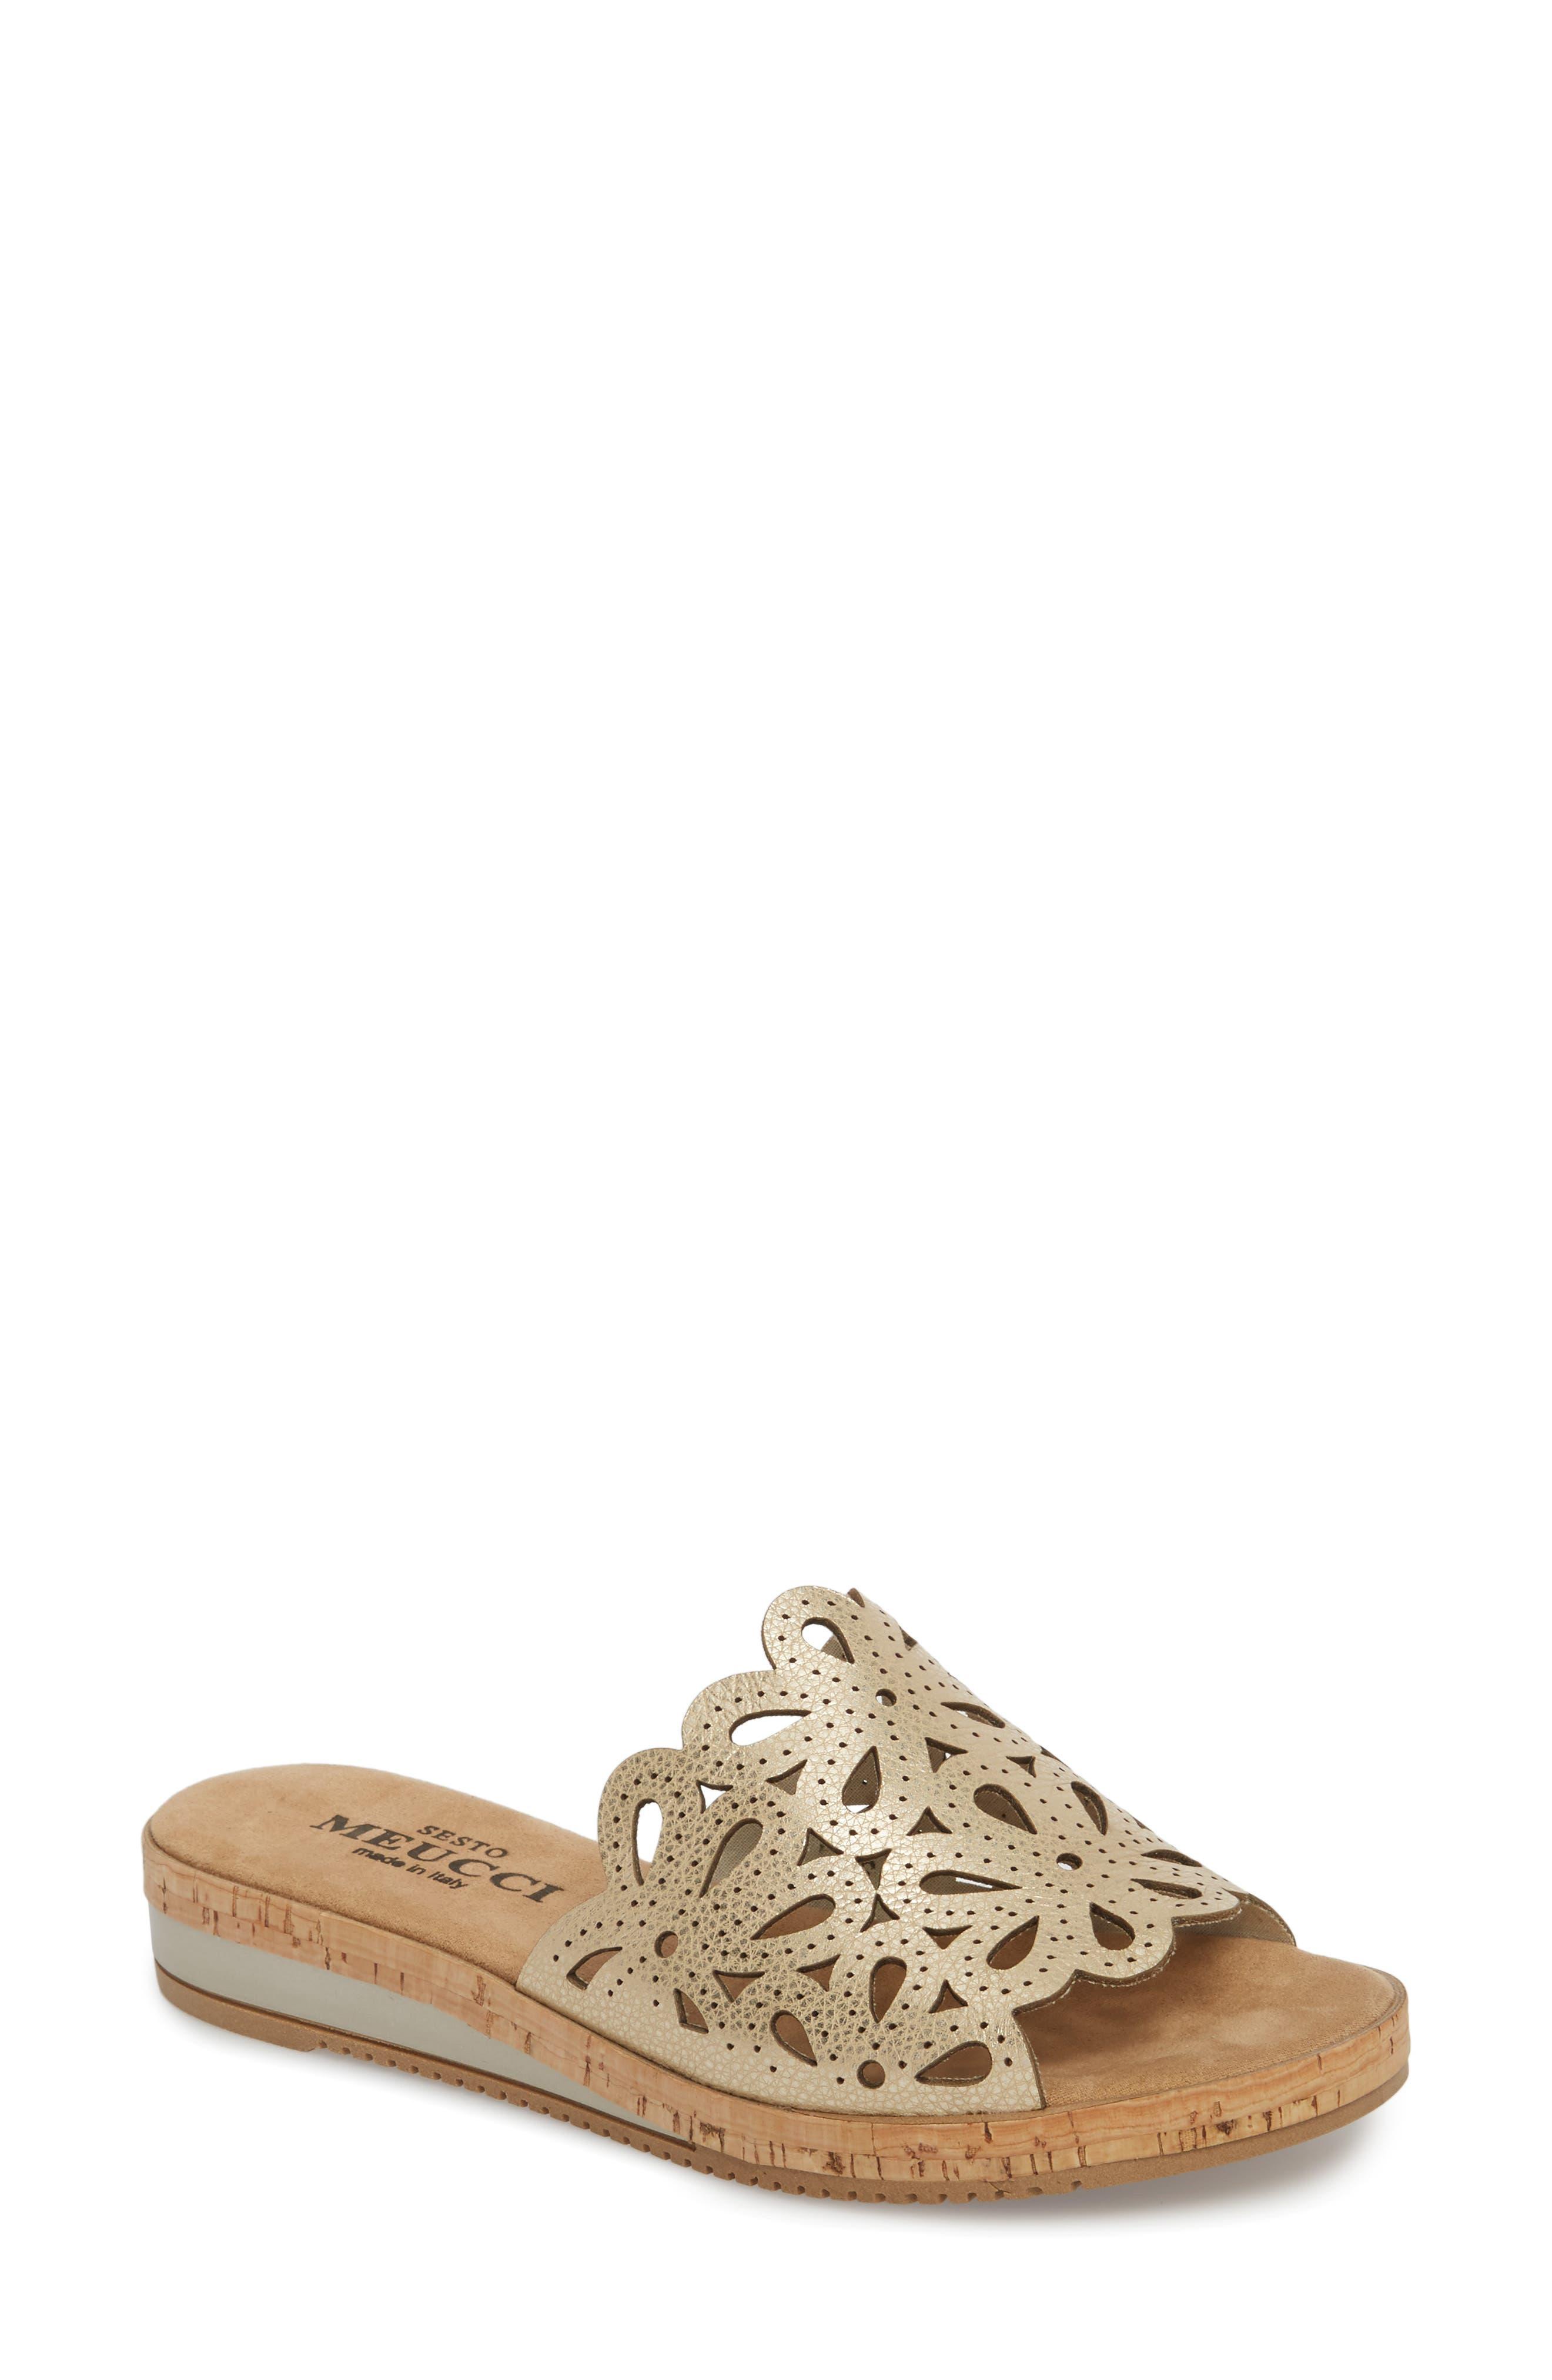 Selina Slide Sandal,                             Main thumbnail 1, color,                             Platino Leather